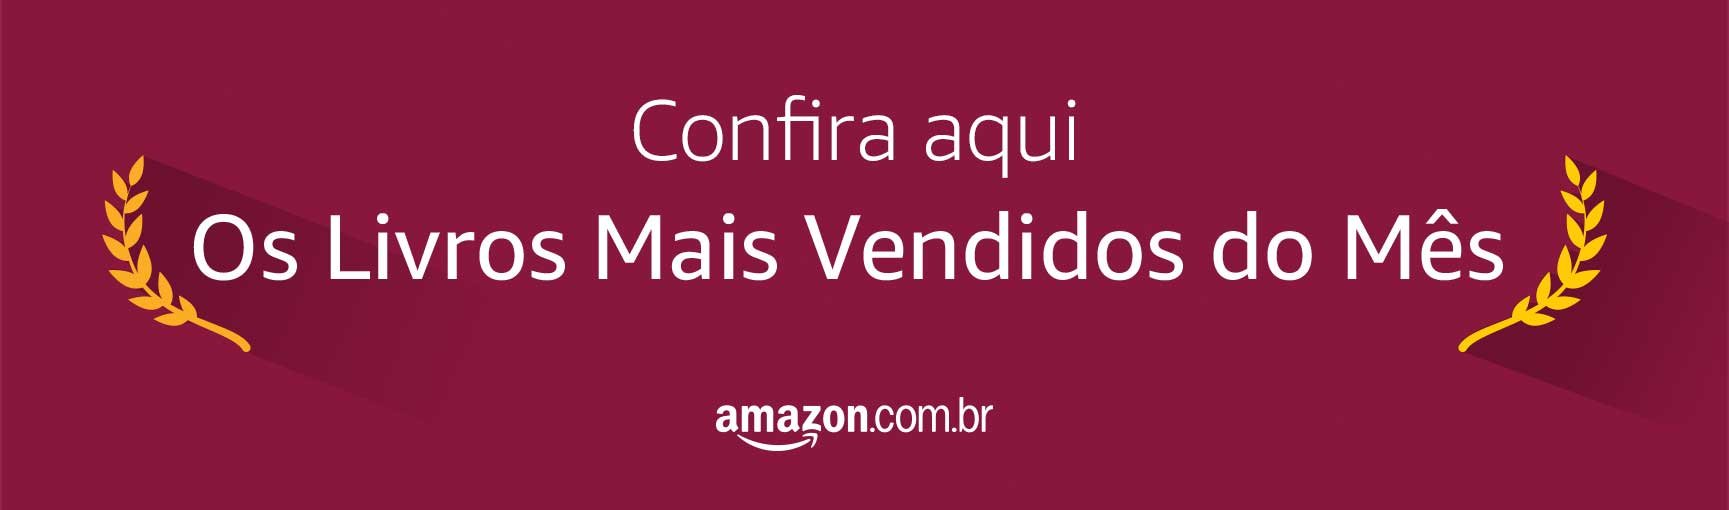 Livros mais vendidos Amazon